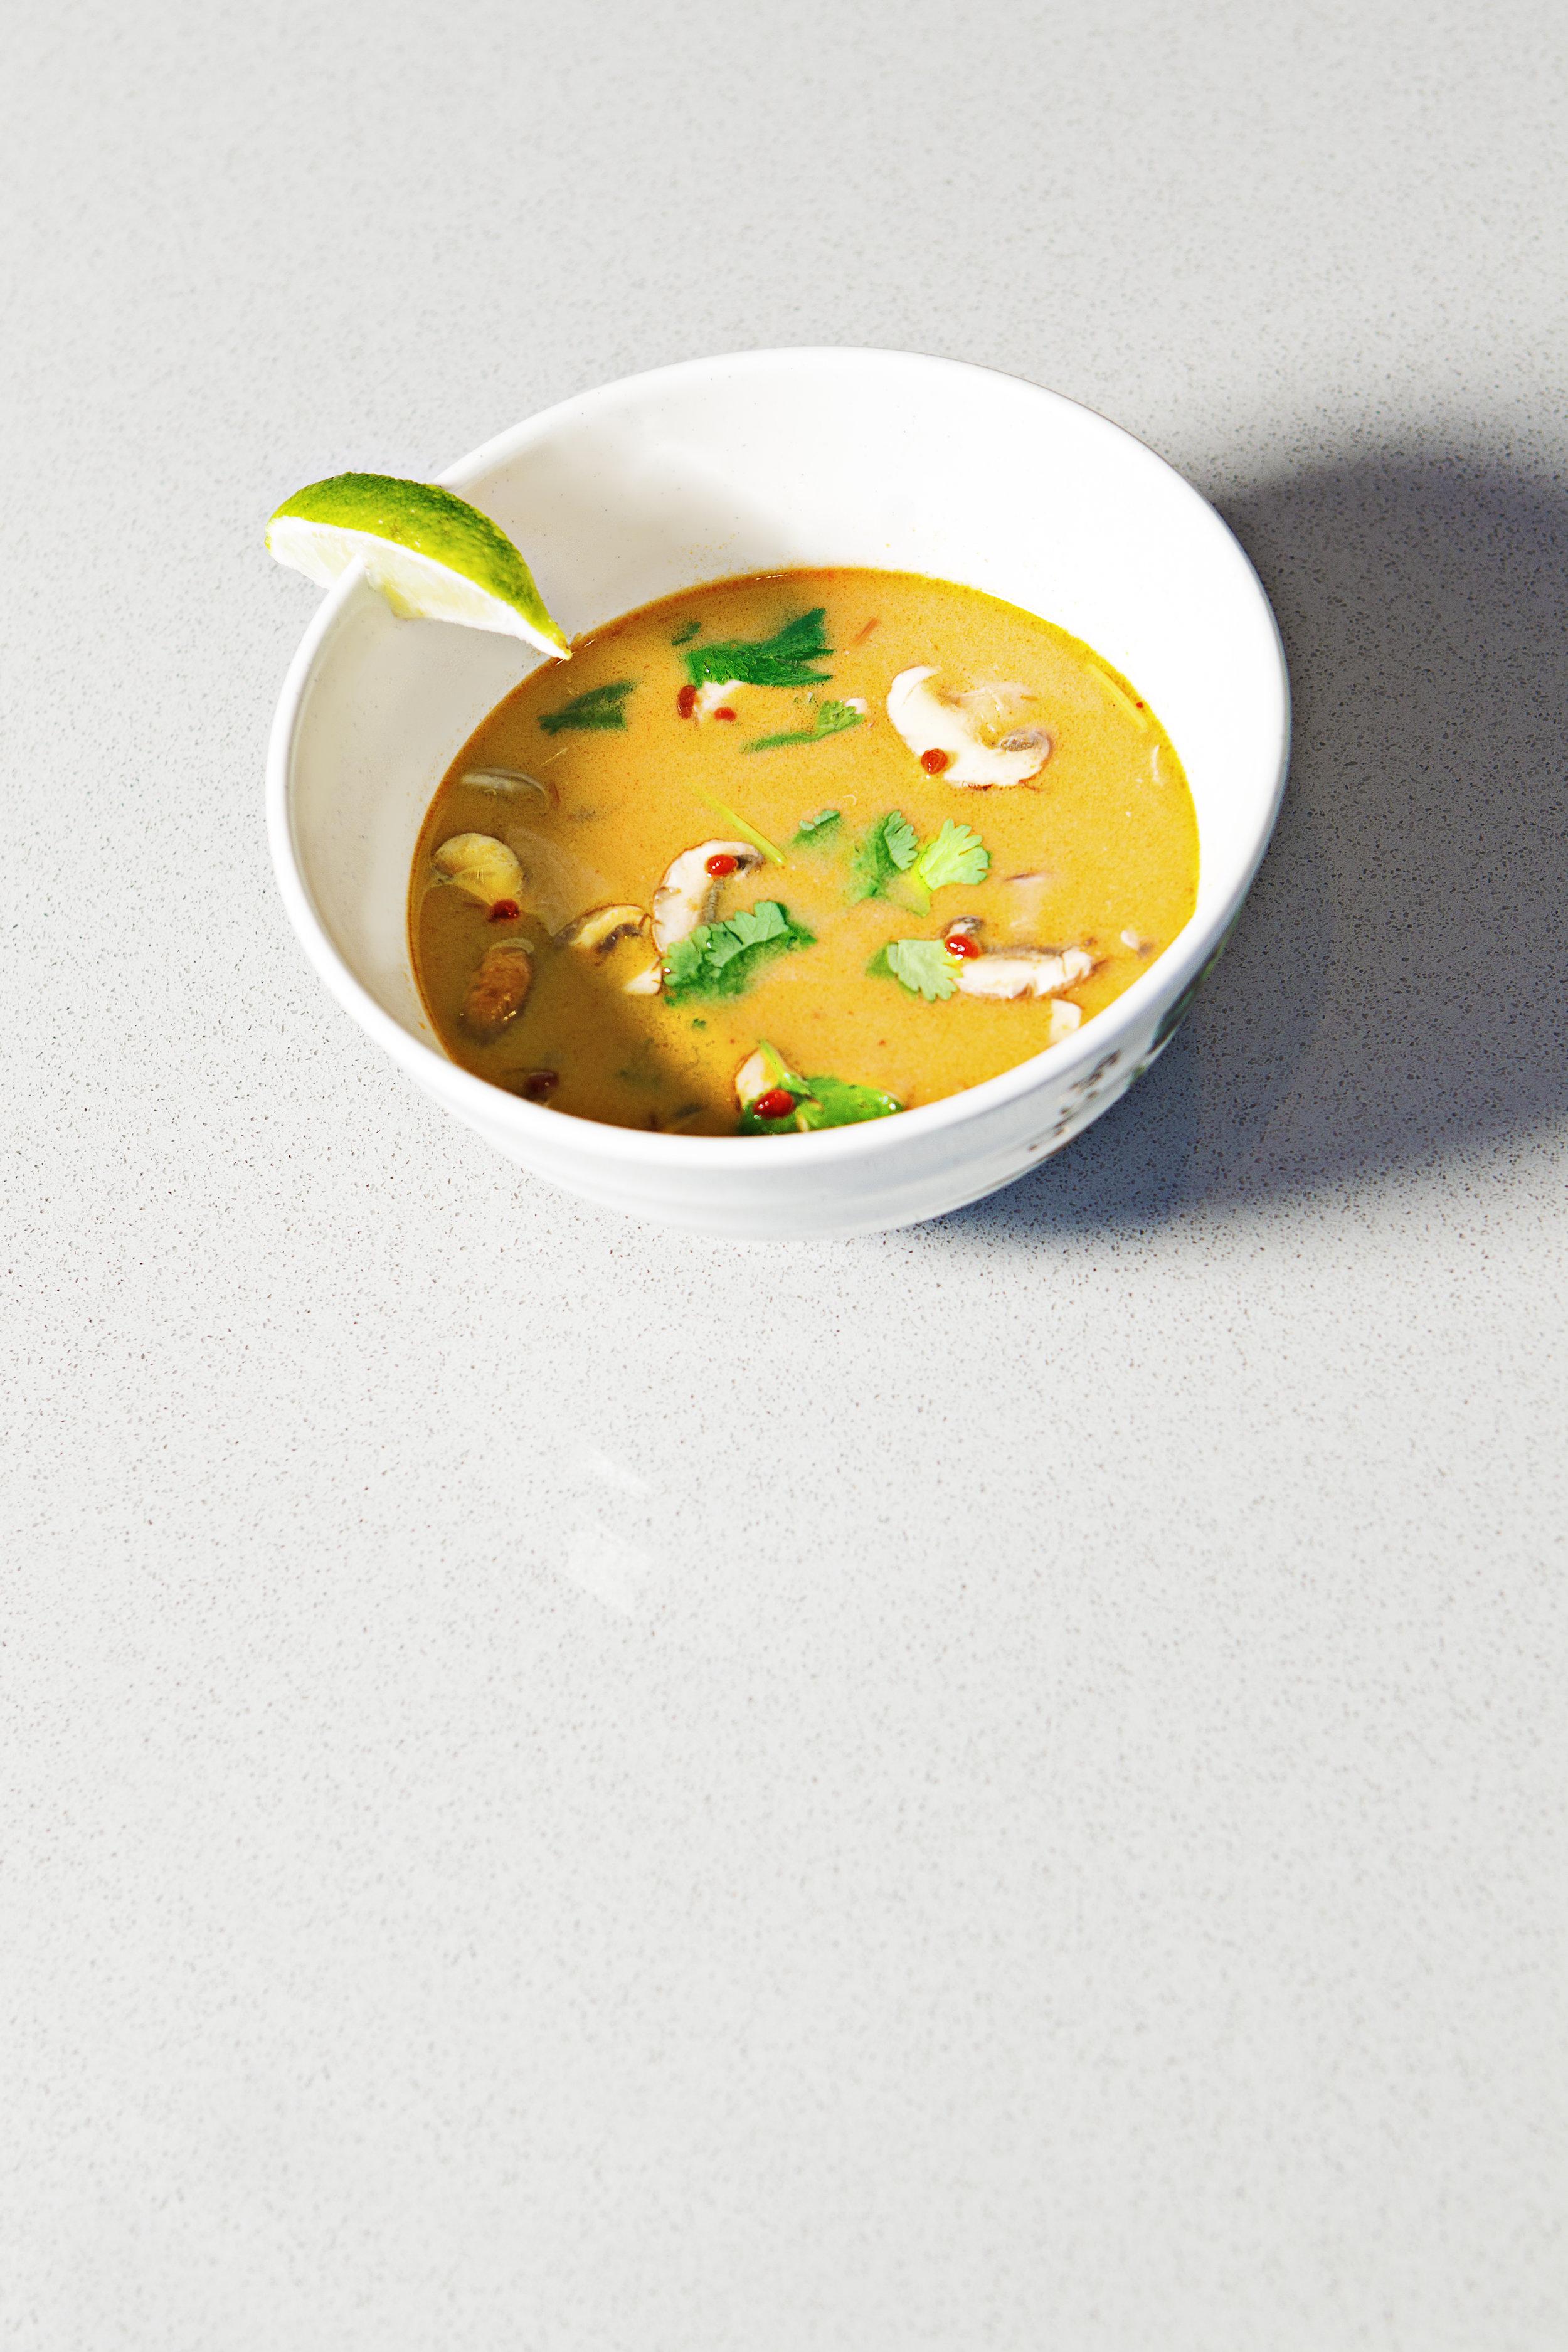 Bowel of soup C9276.jpg